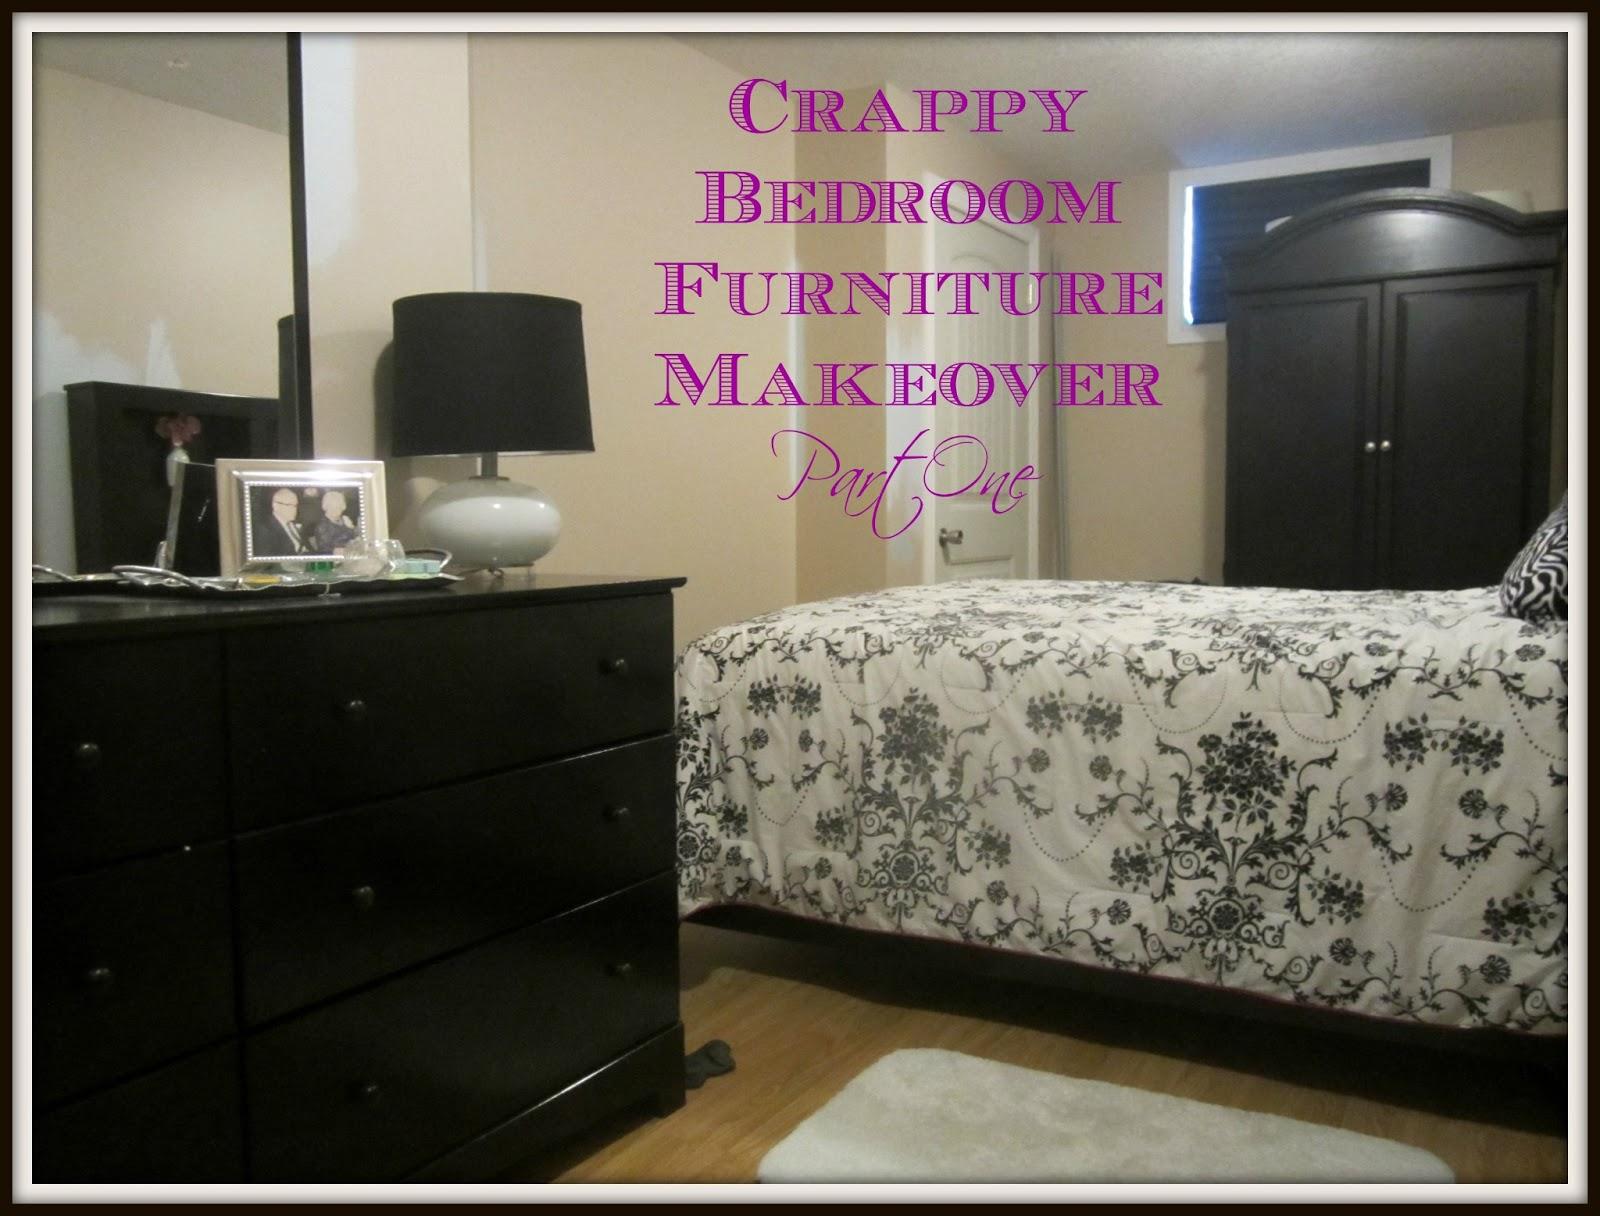 Local Bedroom Furniture Stores Bedroom Furniture Makeover Part One Cottonwood Lane Designs